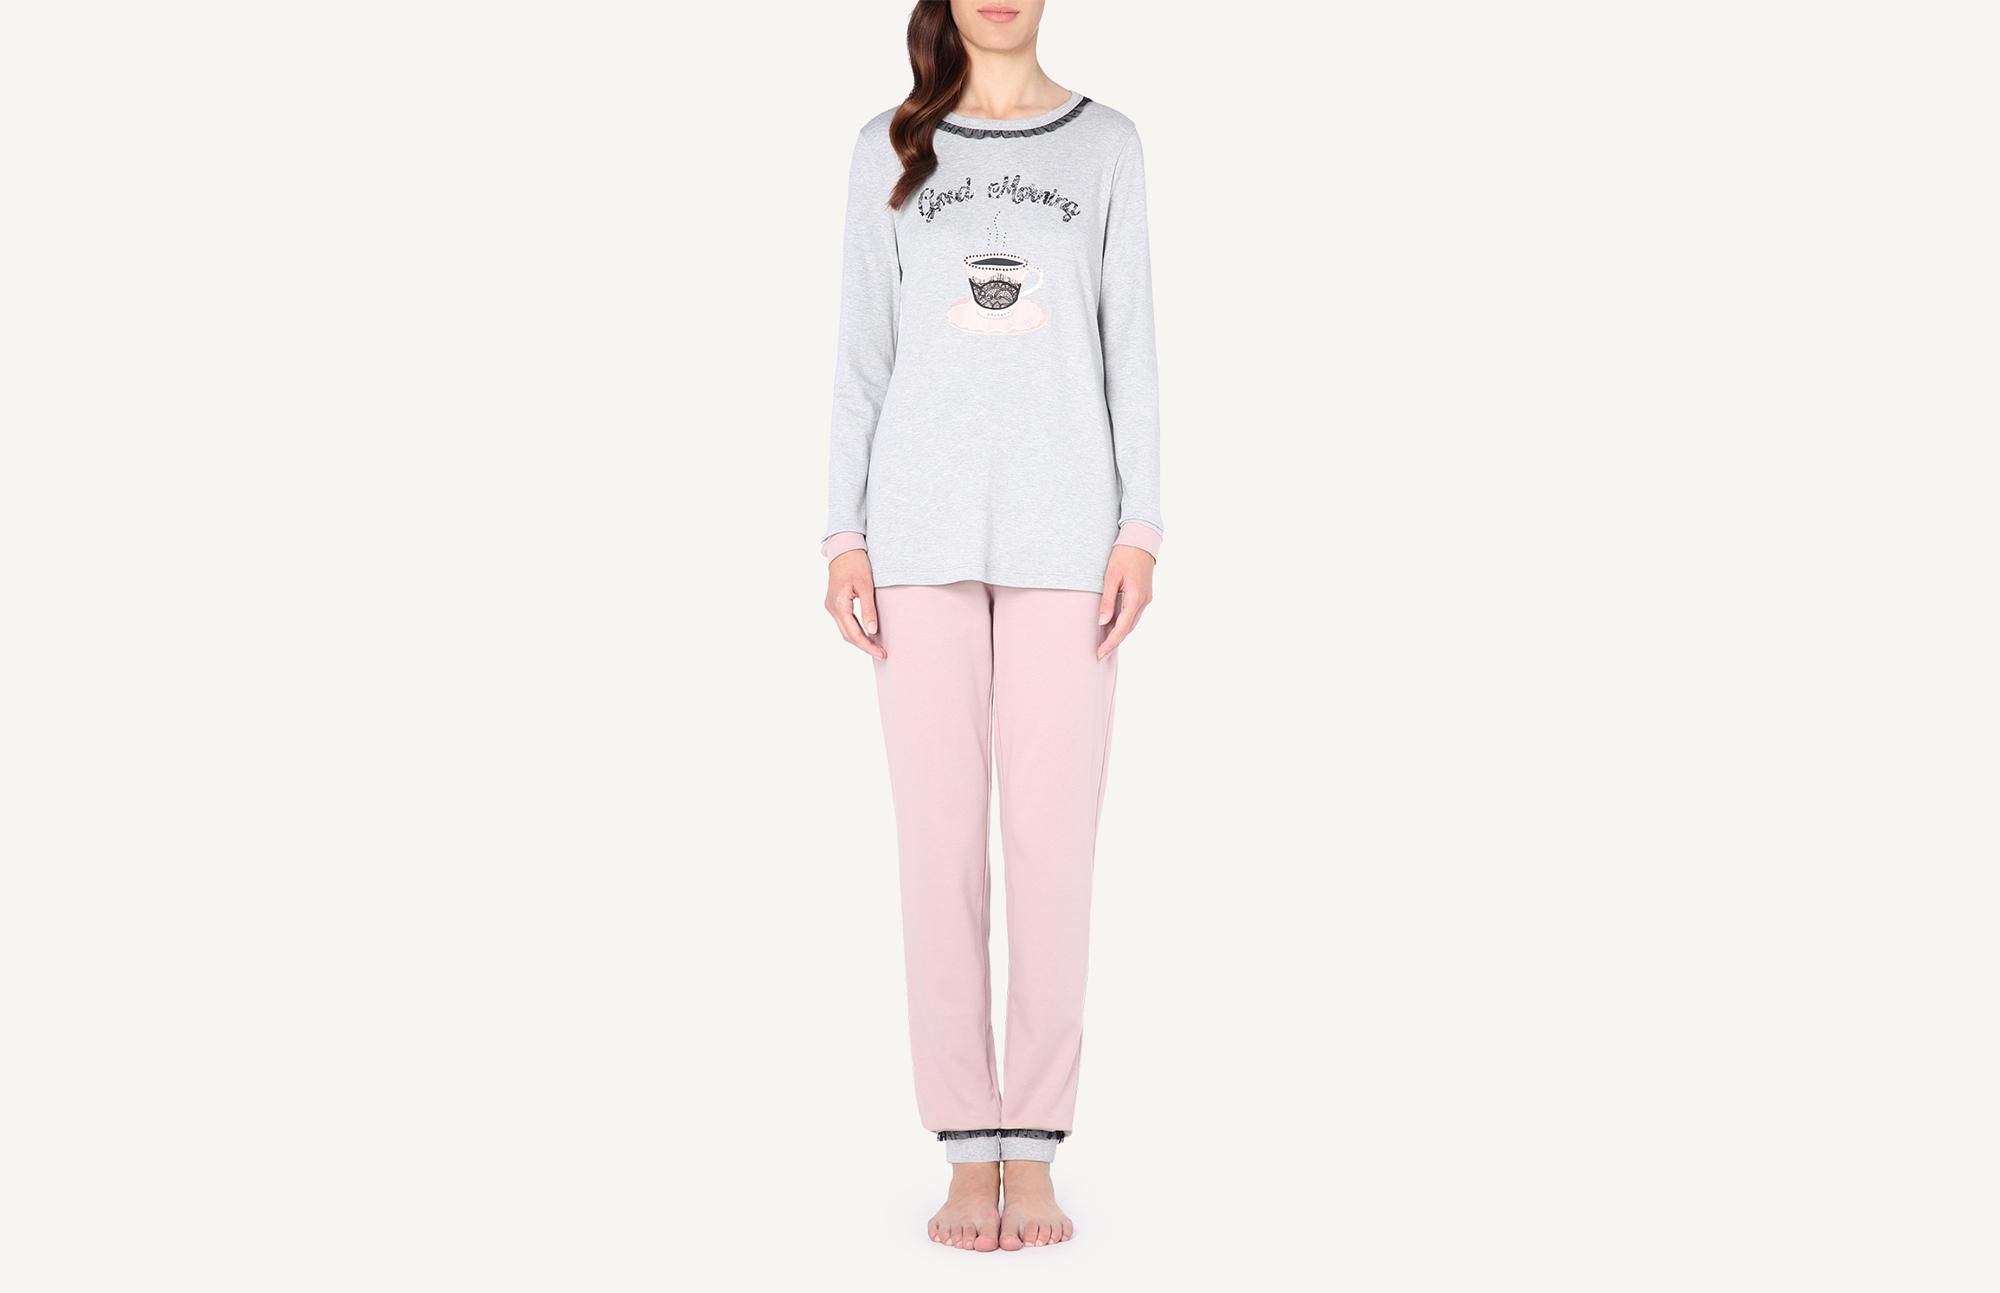 b9fdf3876119 Good Morning Cotton Pajama Set - Intimissimi